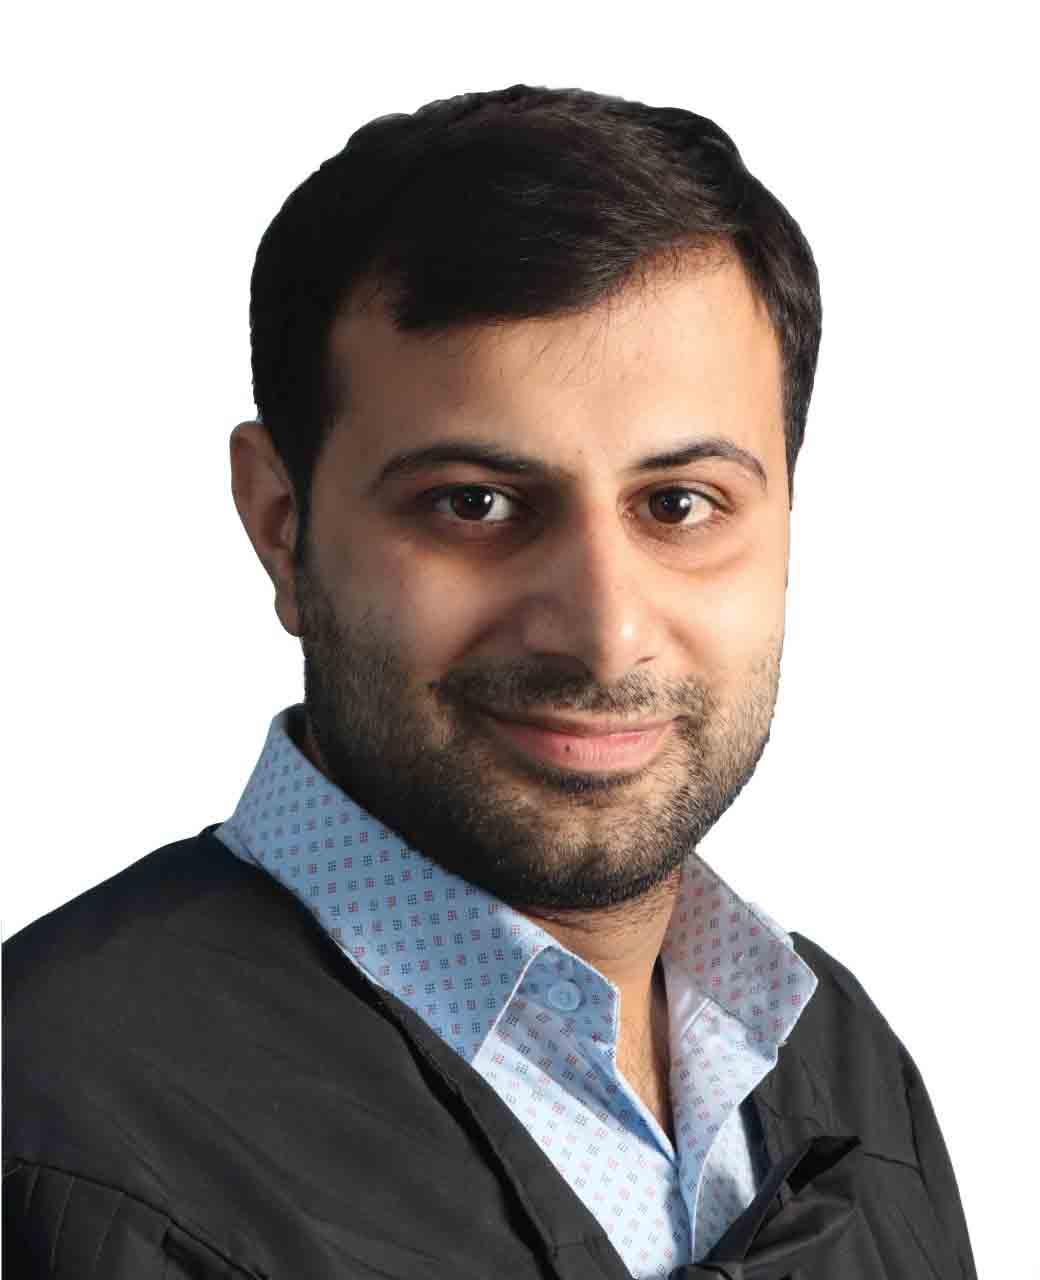 Professor Usman Sarwar